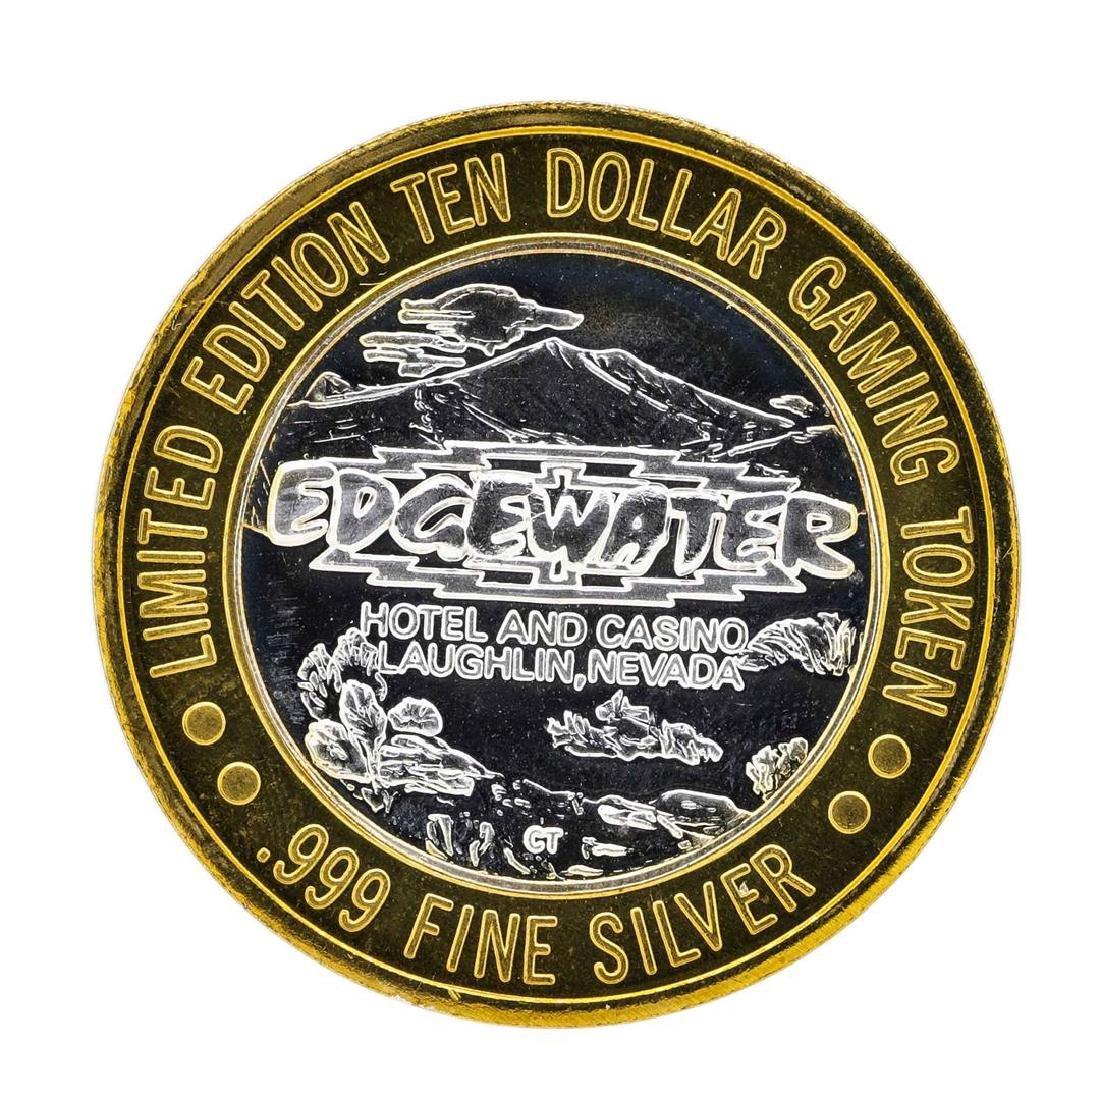 .999 Silver Edgewater Hotel & Casino $10 Casino Limited - 2